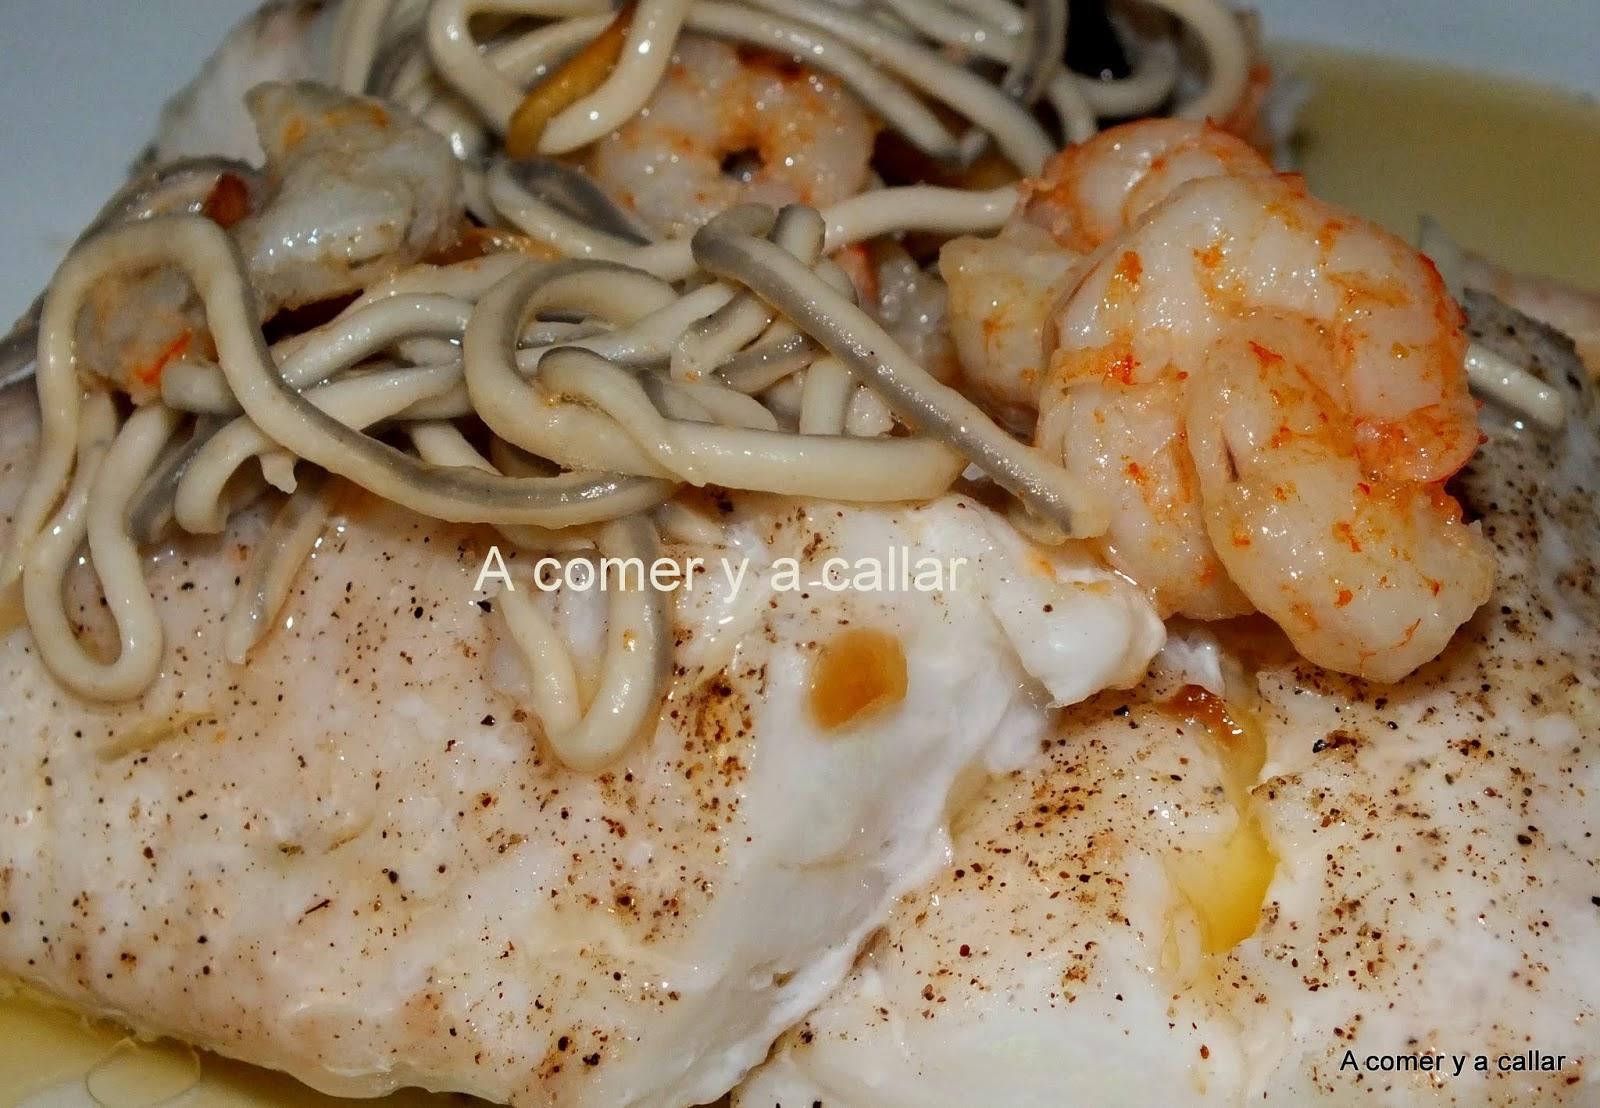 A comer y a callar merluza al horno con gulas y gambas for Merluza rellena al horno